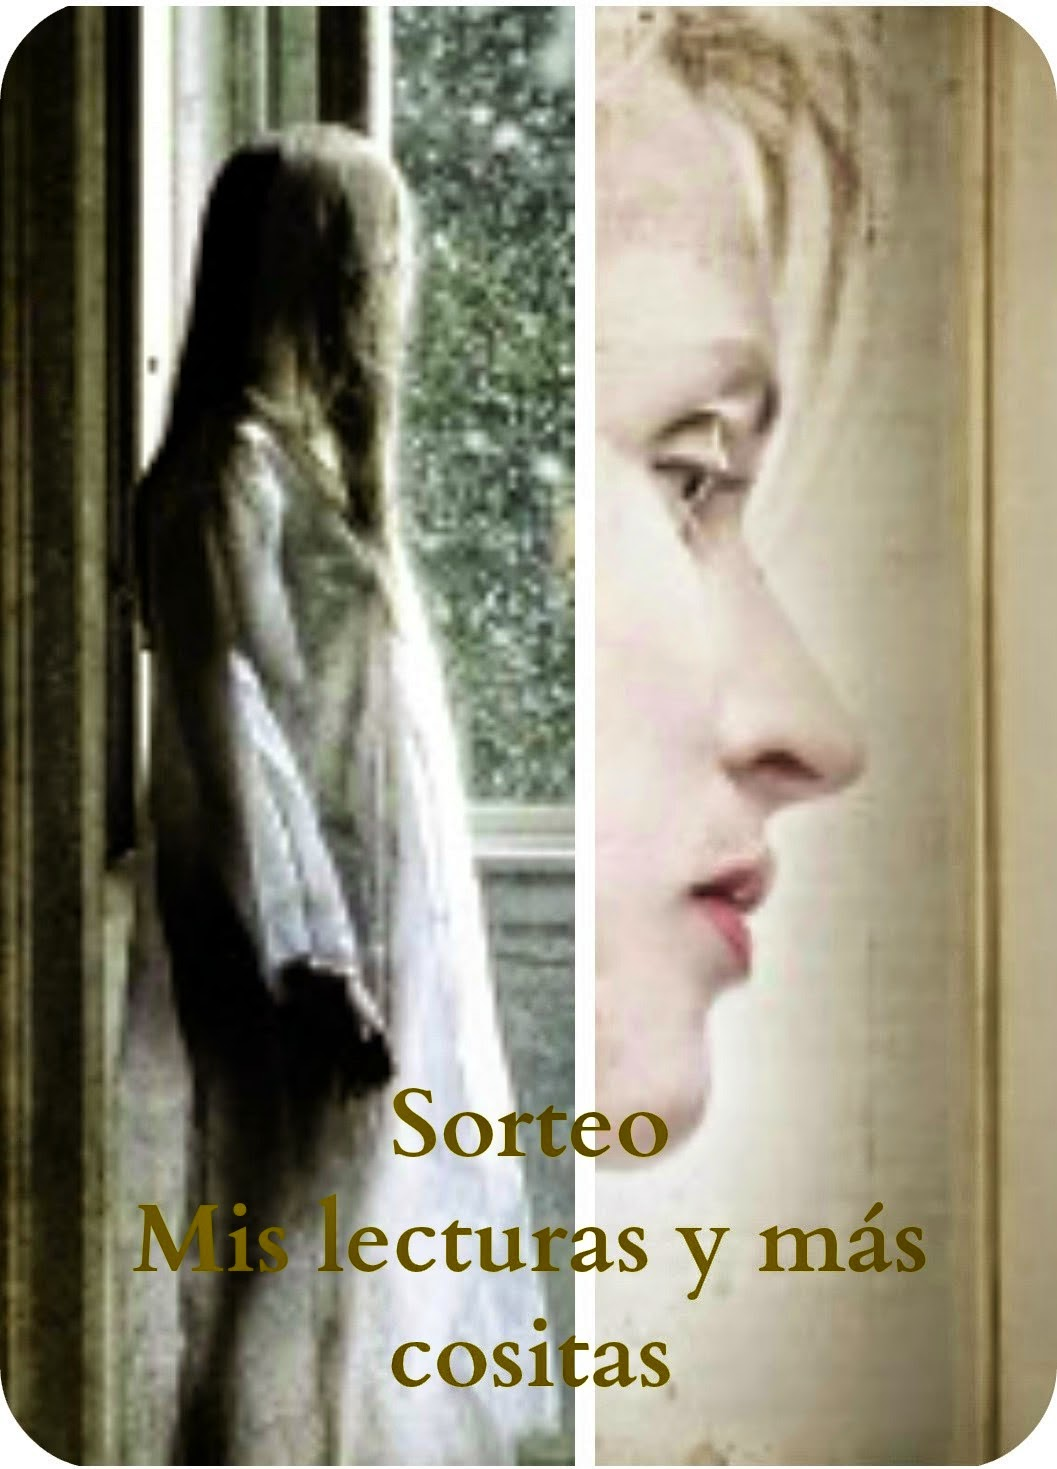 http://mislecturasymascositas.blogspot.com.es/2014/10/sorteo-en-el-blog.html